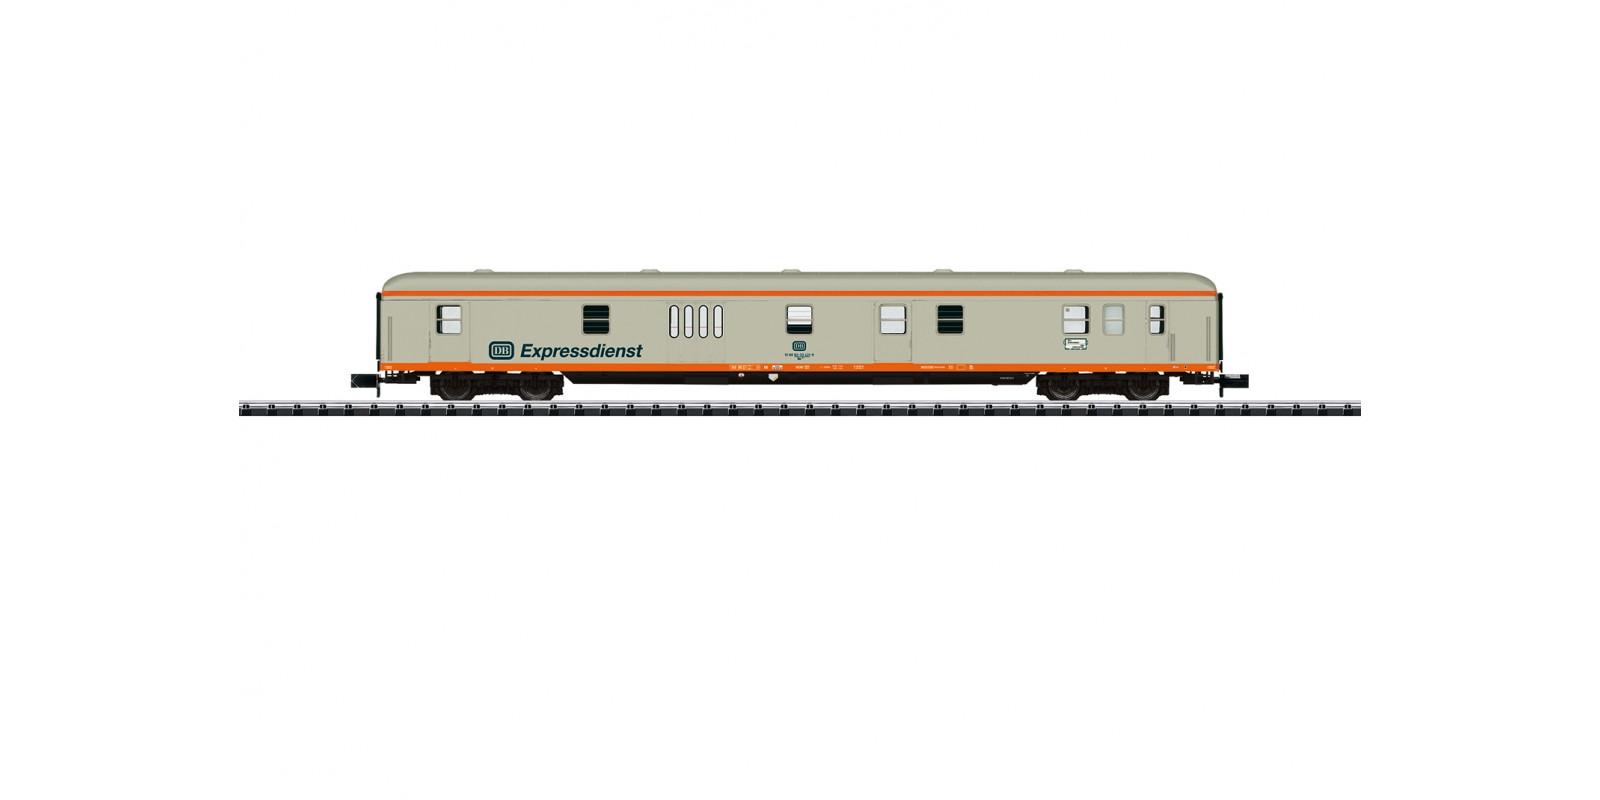 T15985 Type Dm 903 Baggage Car